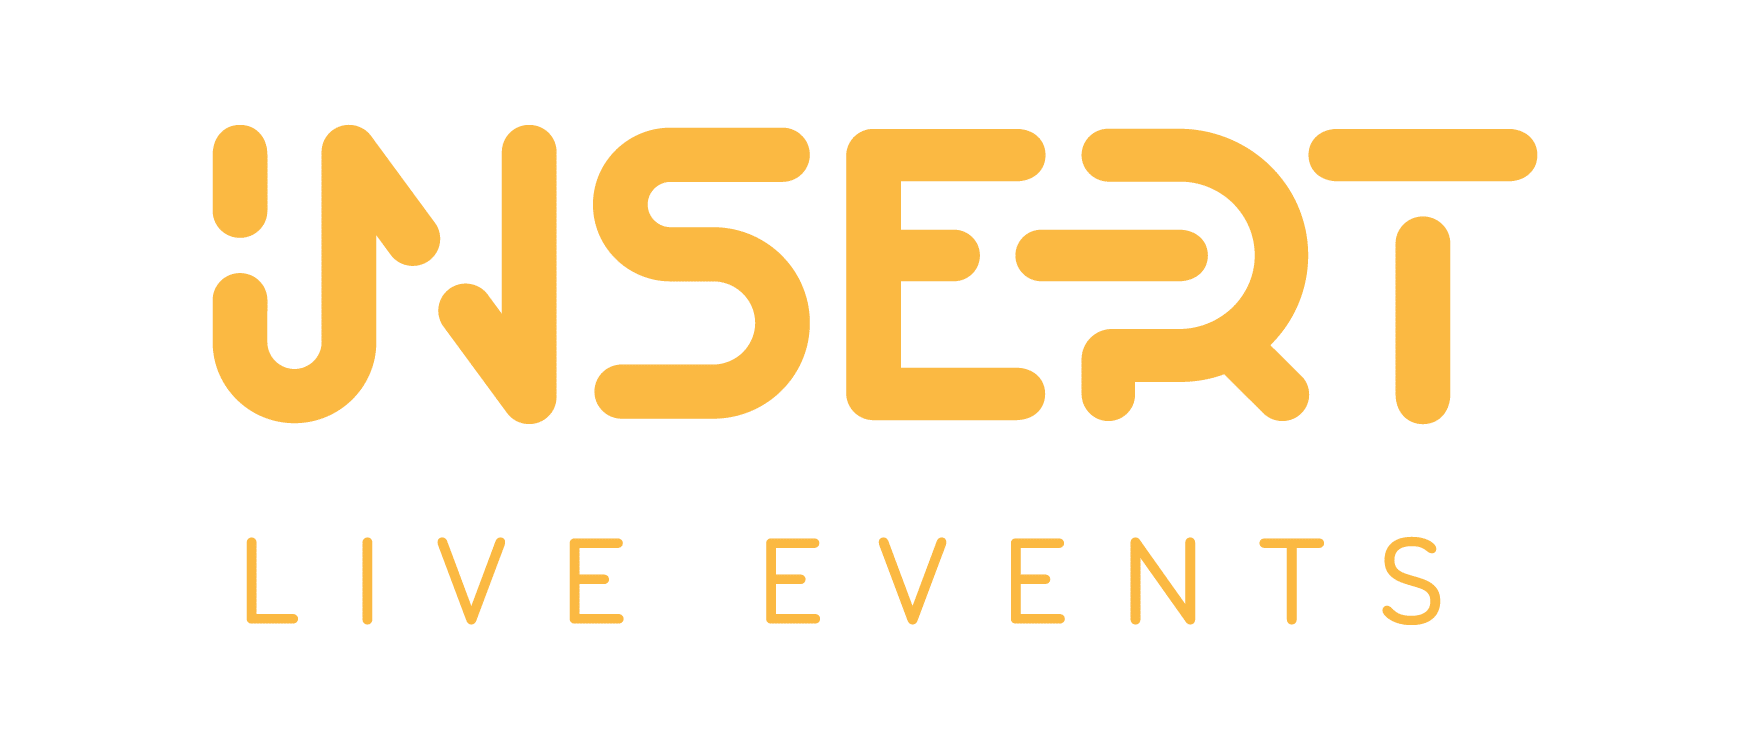 insert live events rebranding, yellow logo